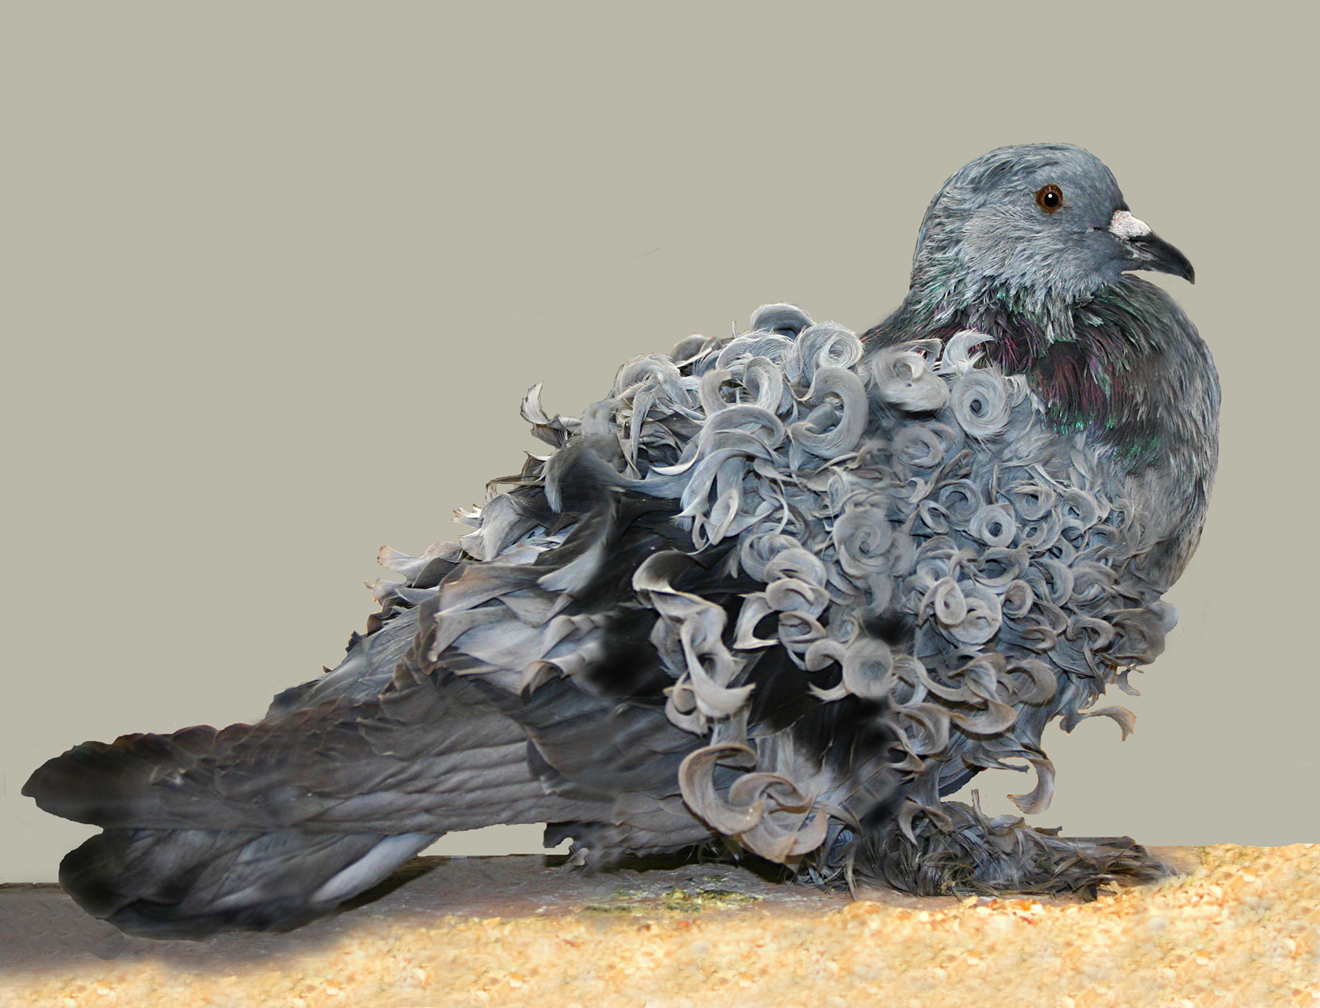 https://images.wikia.com/pigeons/images/b/b4/Frillback_pigeon.jpg